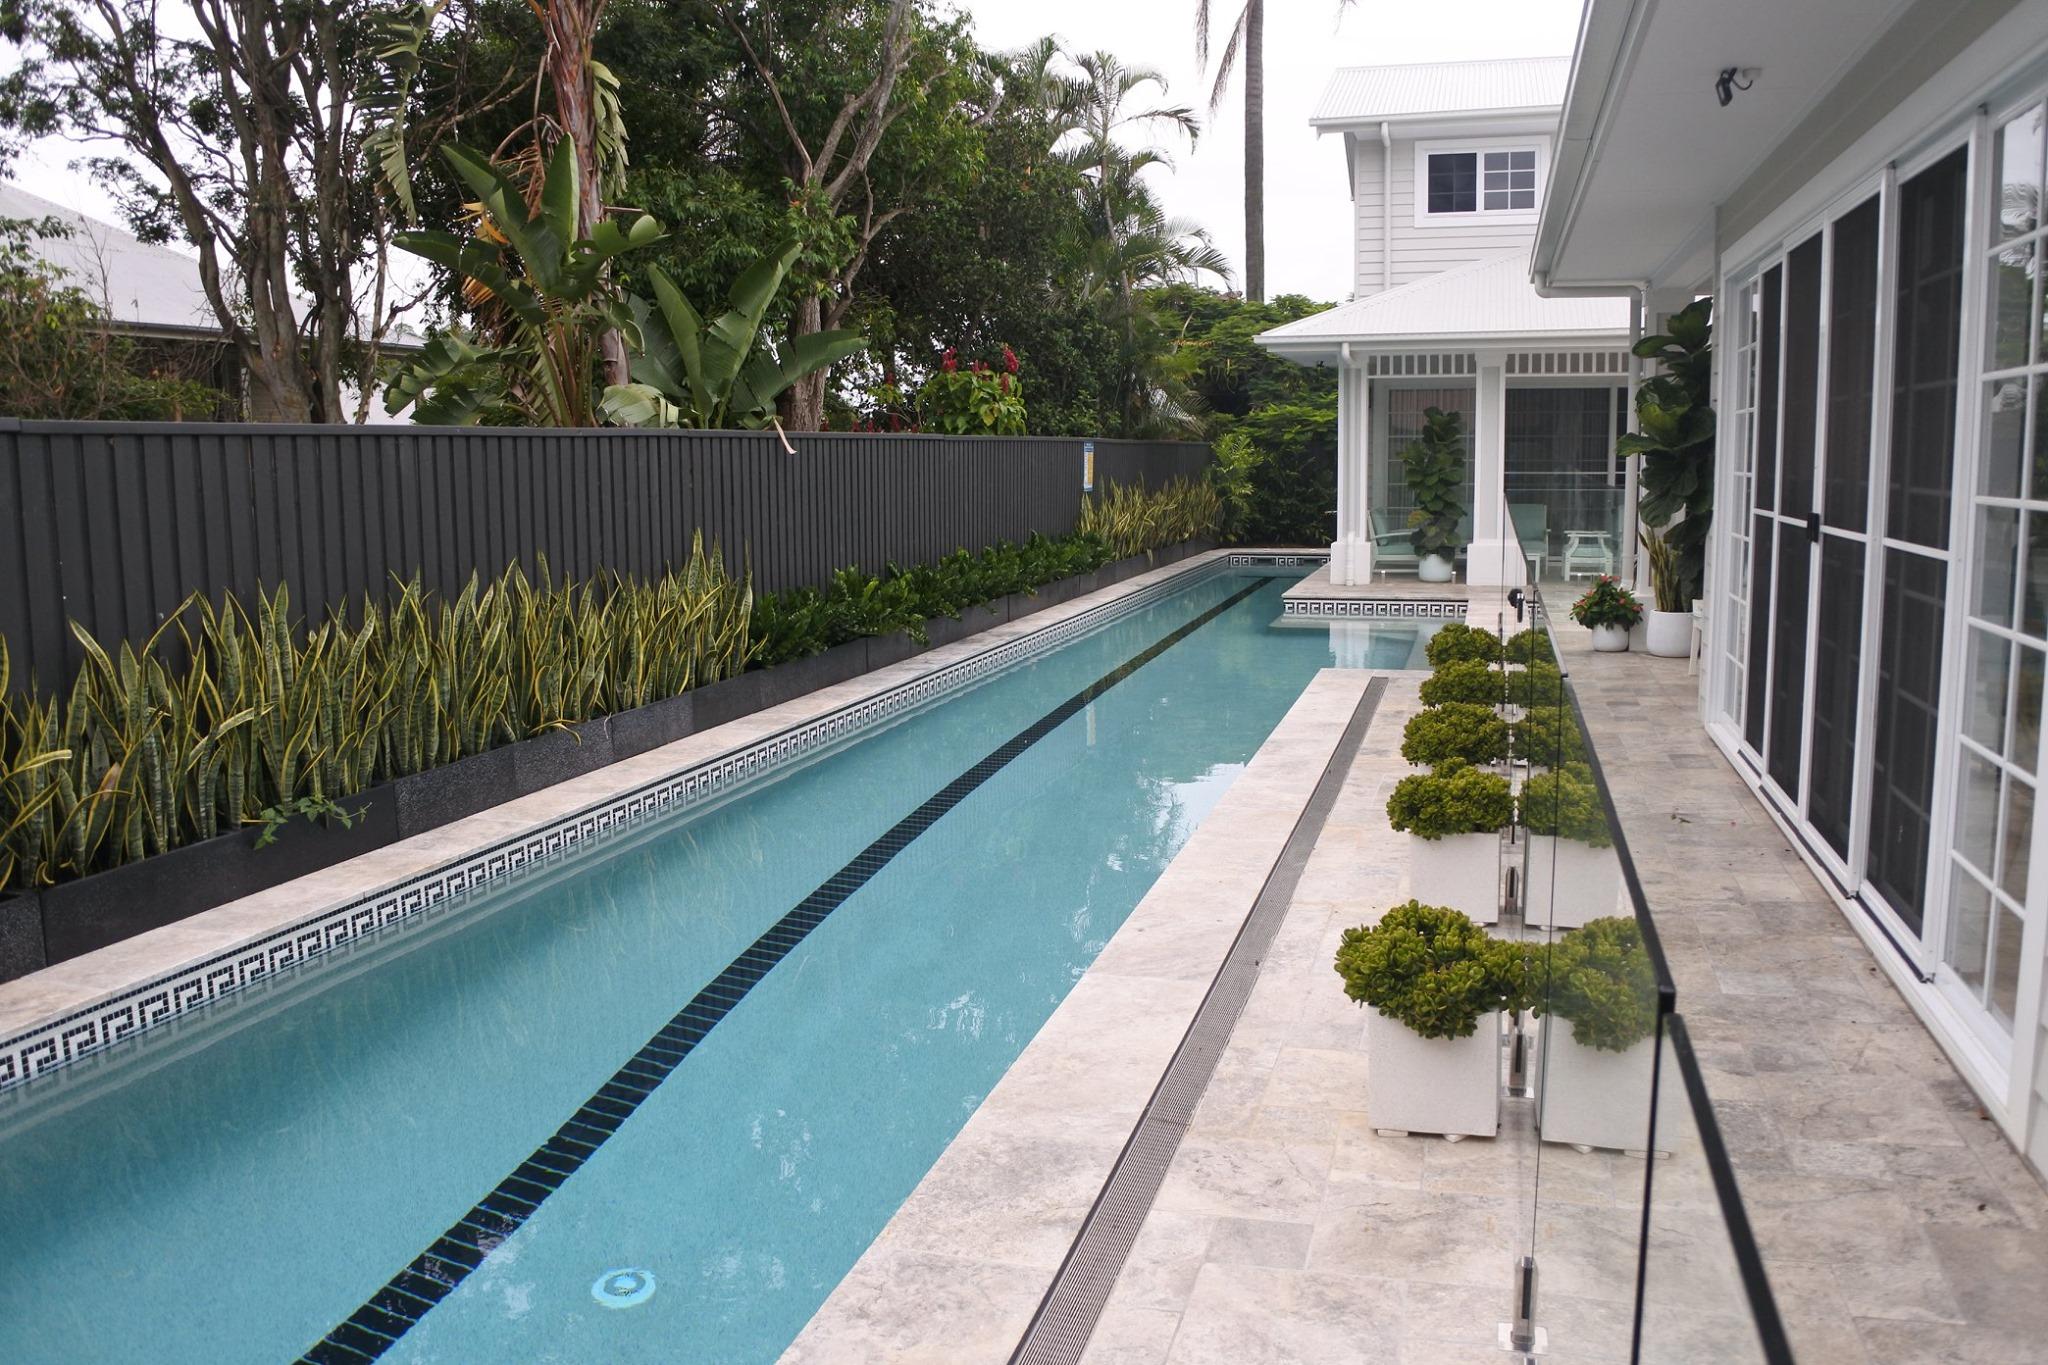 Burleigh Pools Swimming Pool Contractors